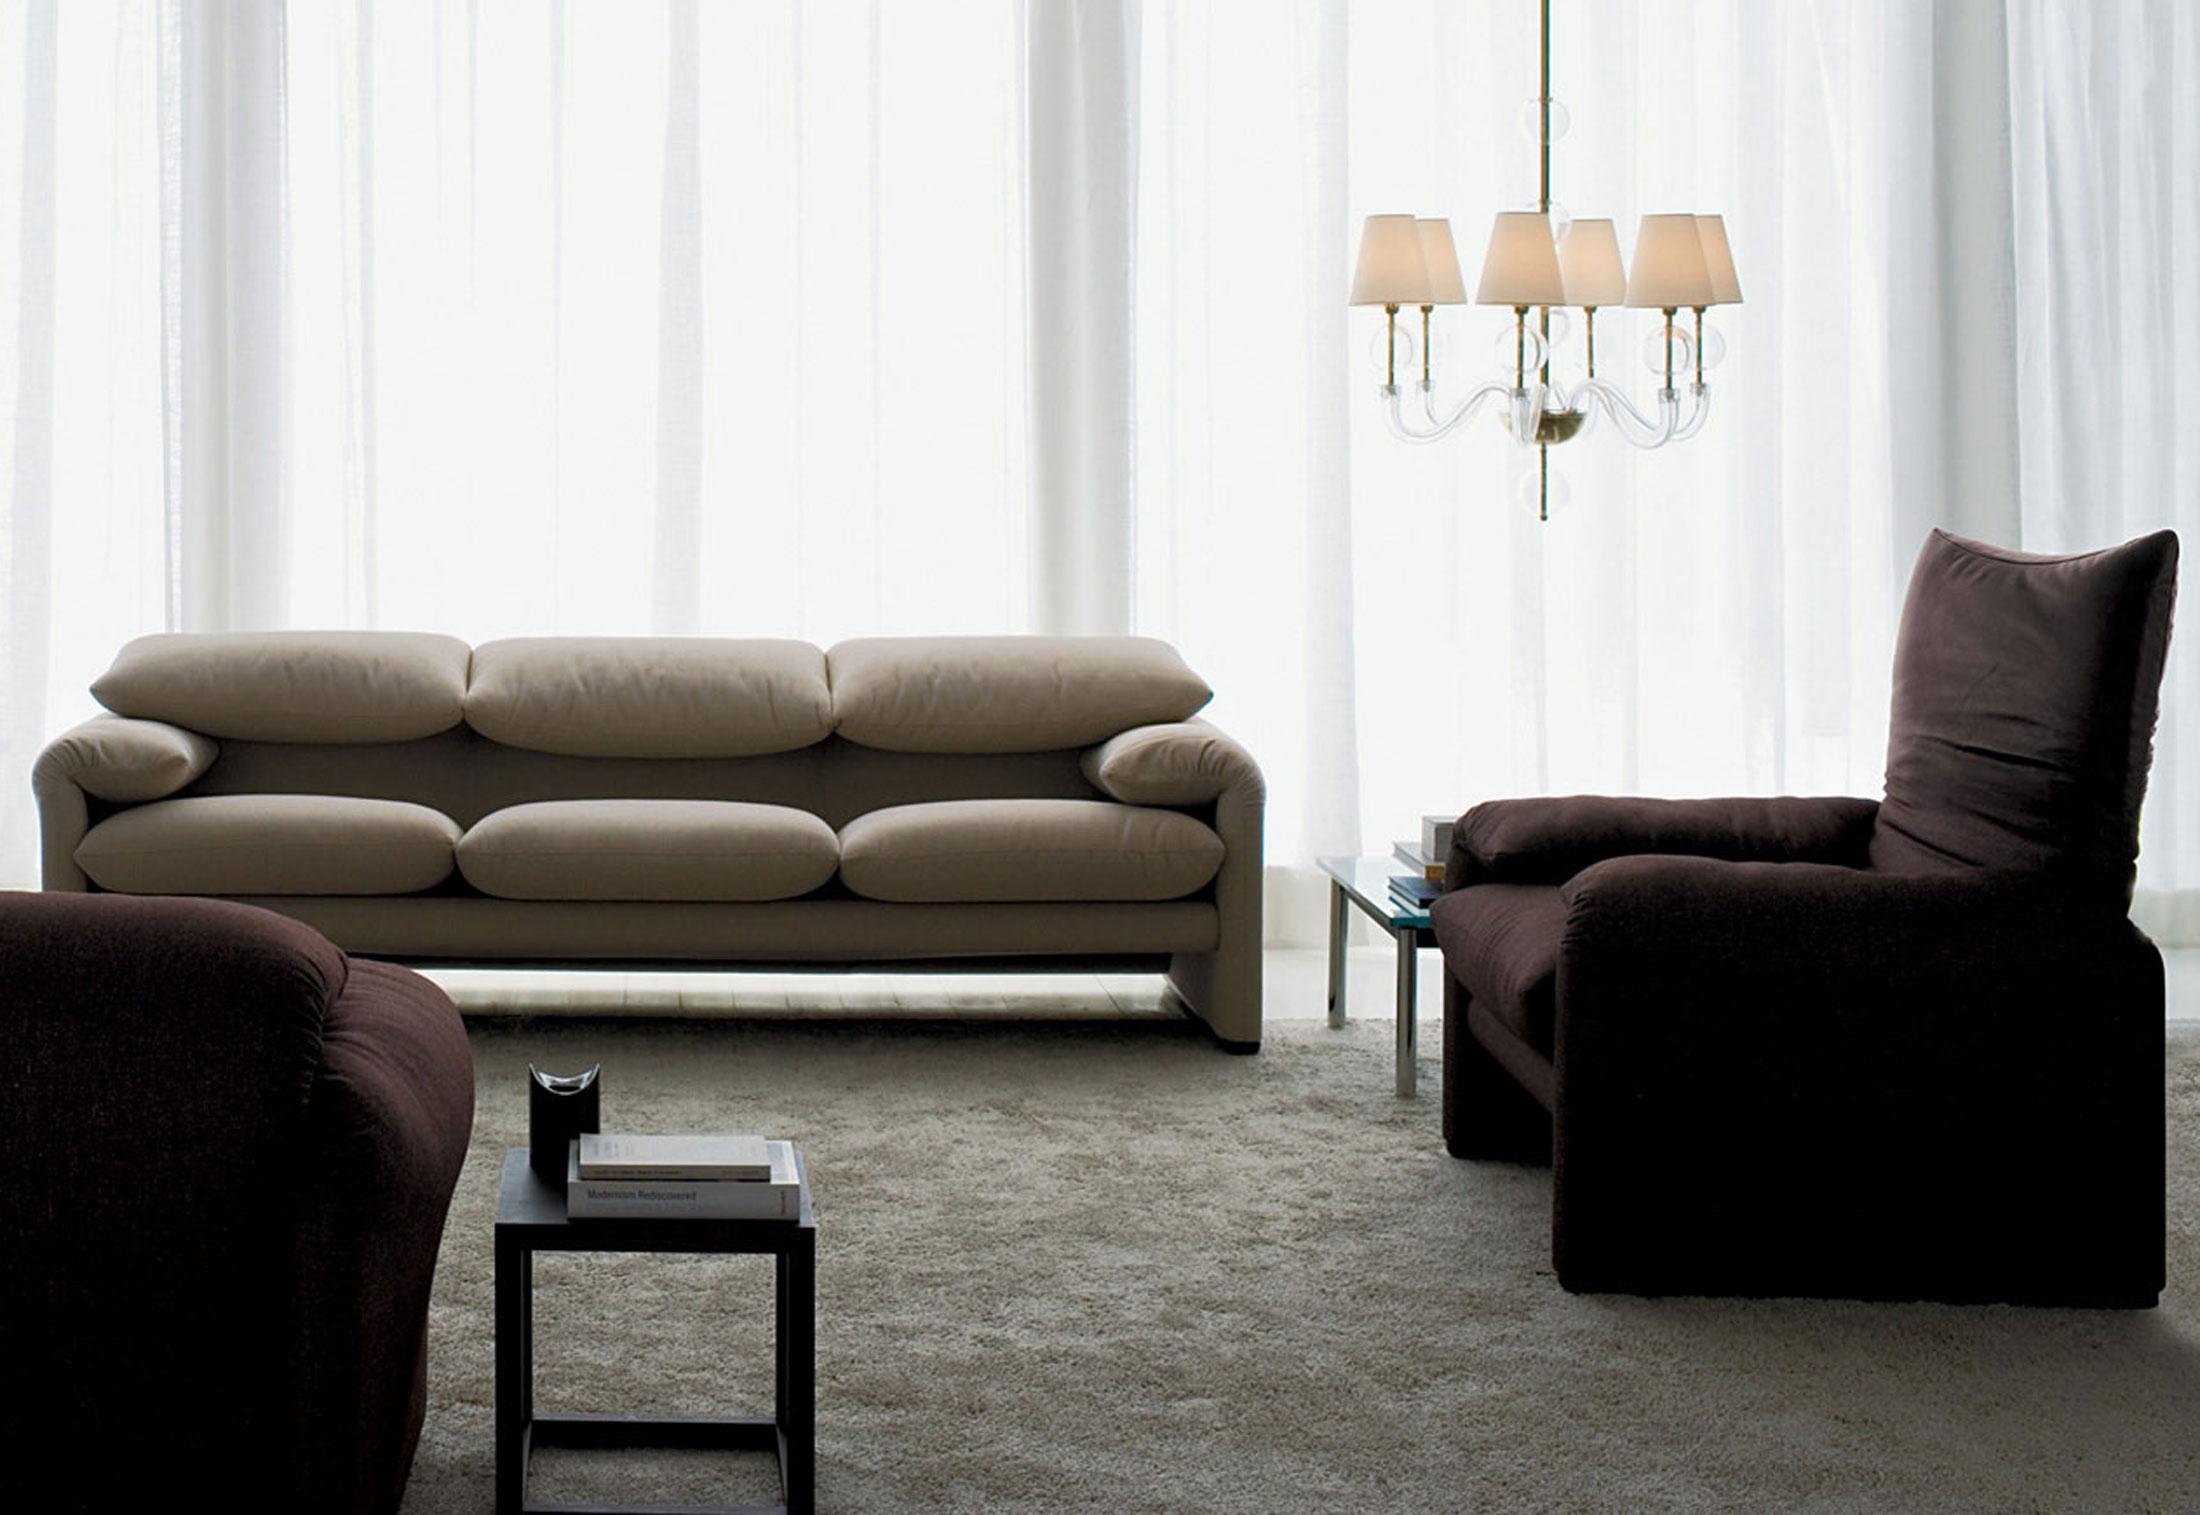 Maralunga 3-Sitzer Sofa von Cassina | STYLEPARK